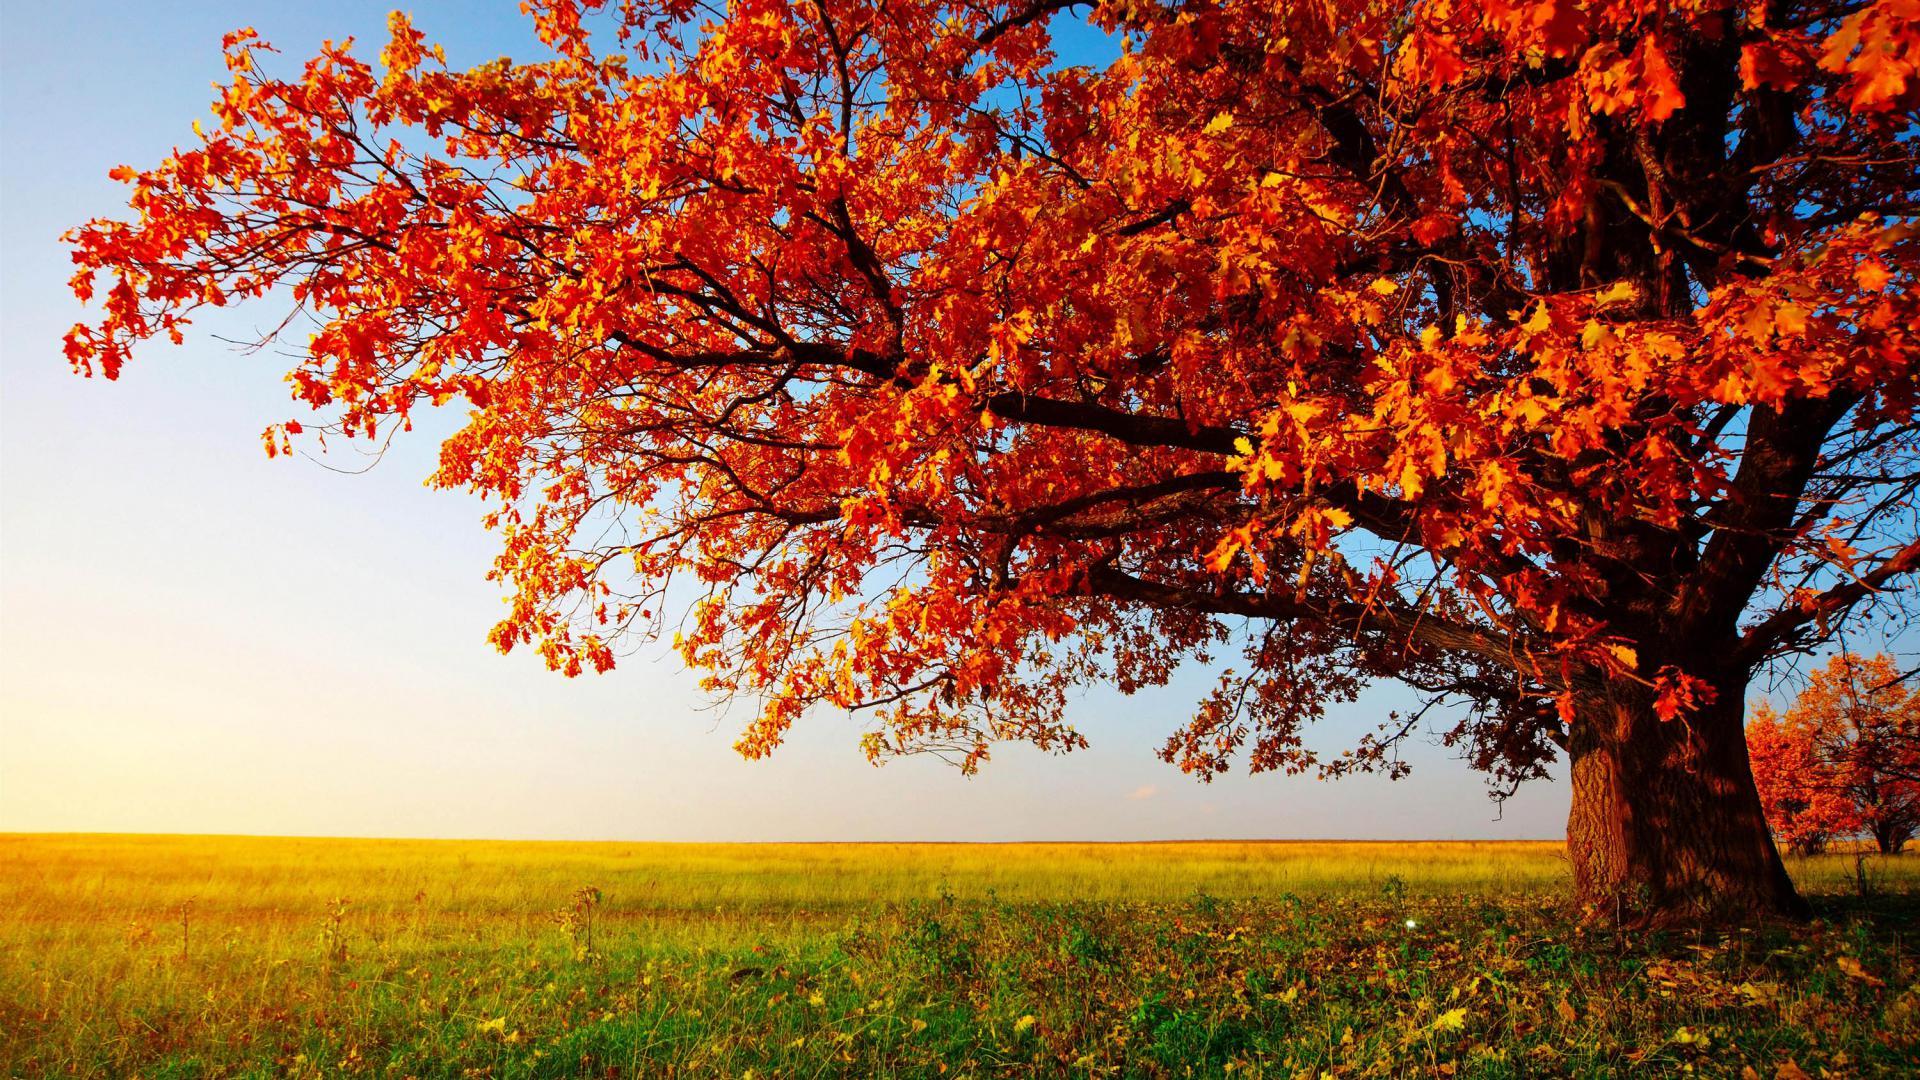 Nature Free Desktop Wallpapers Obtain 4432 Hd Wallpaper Backgrounds Download